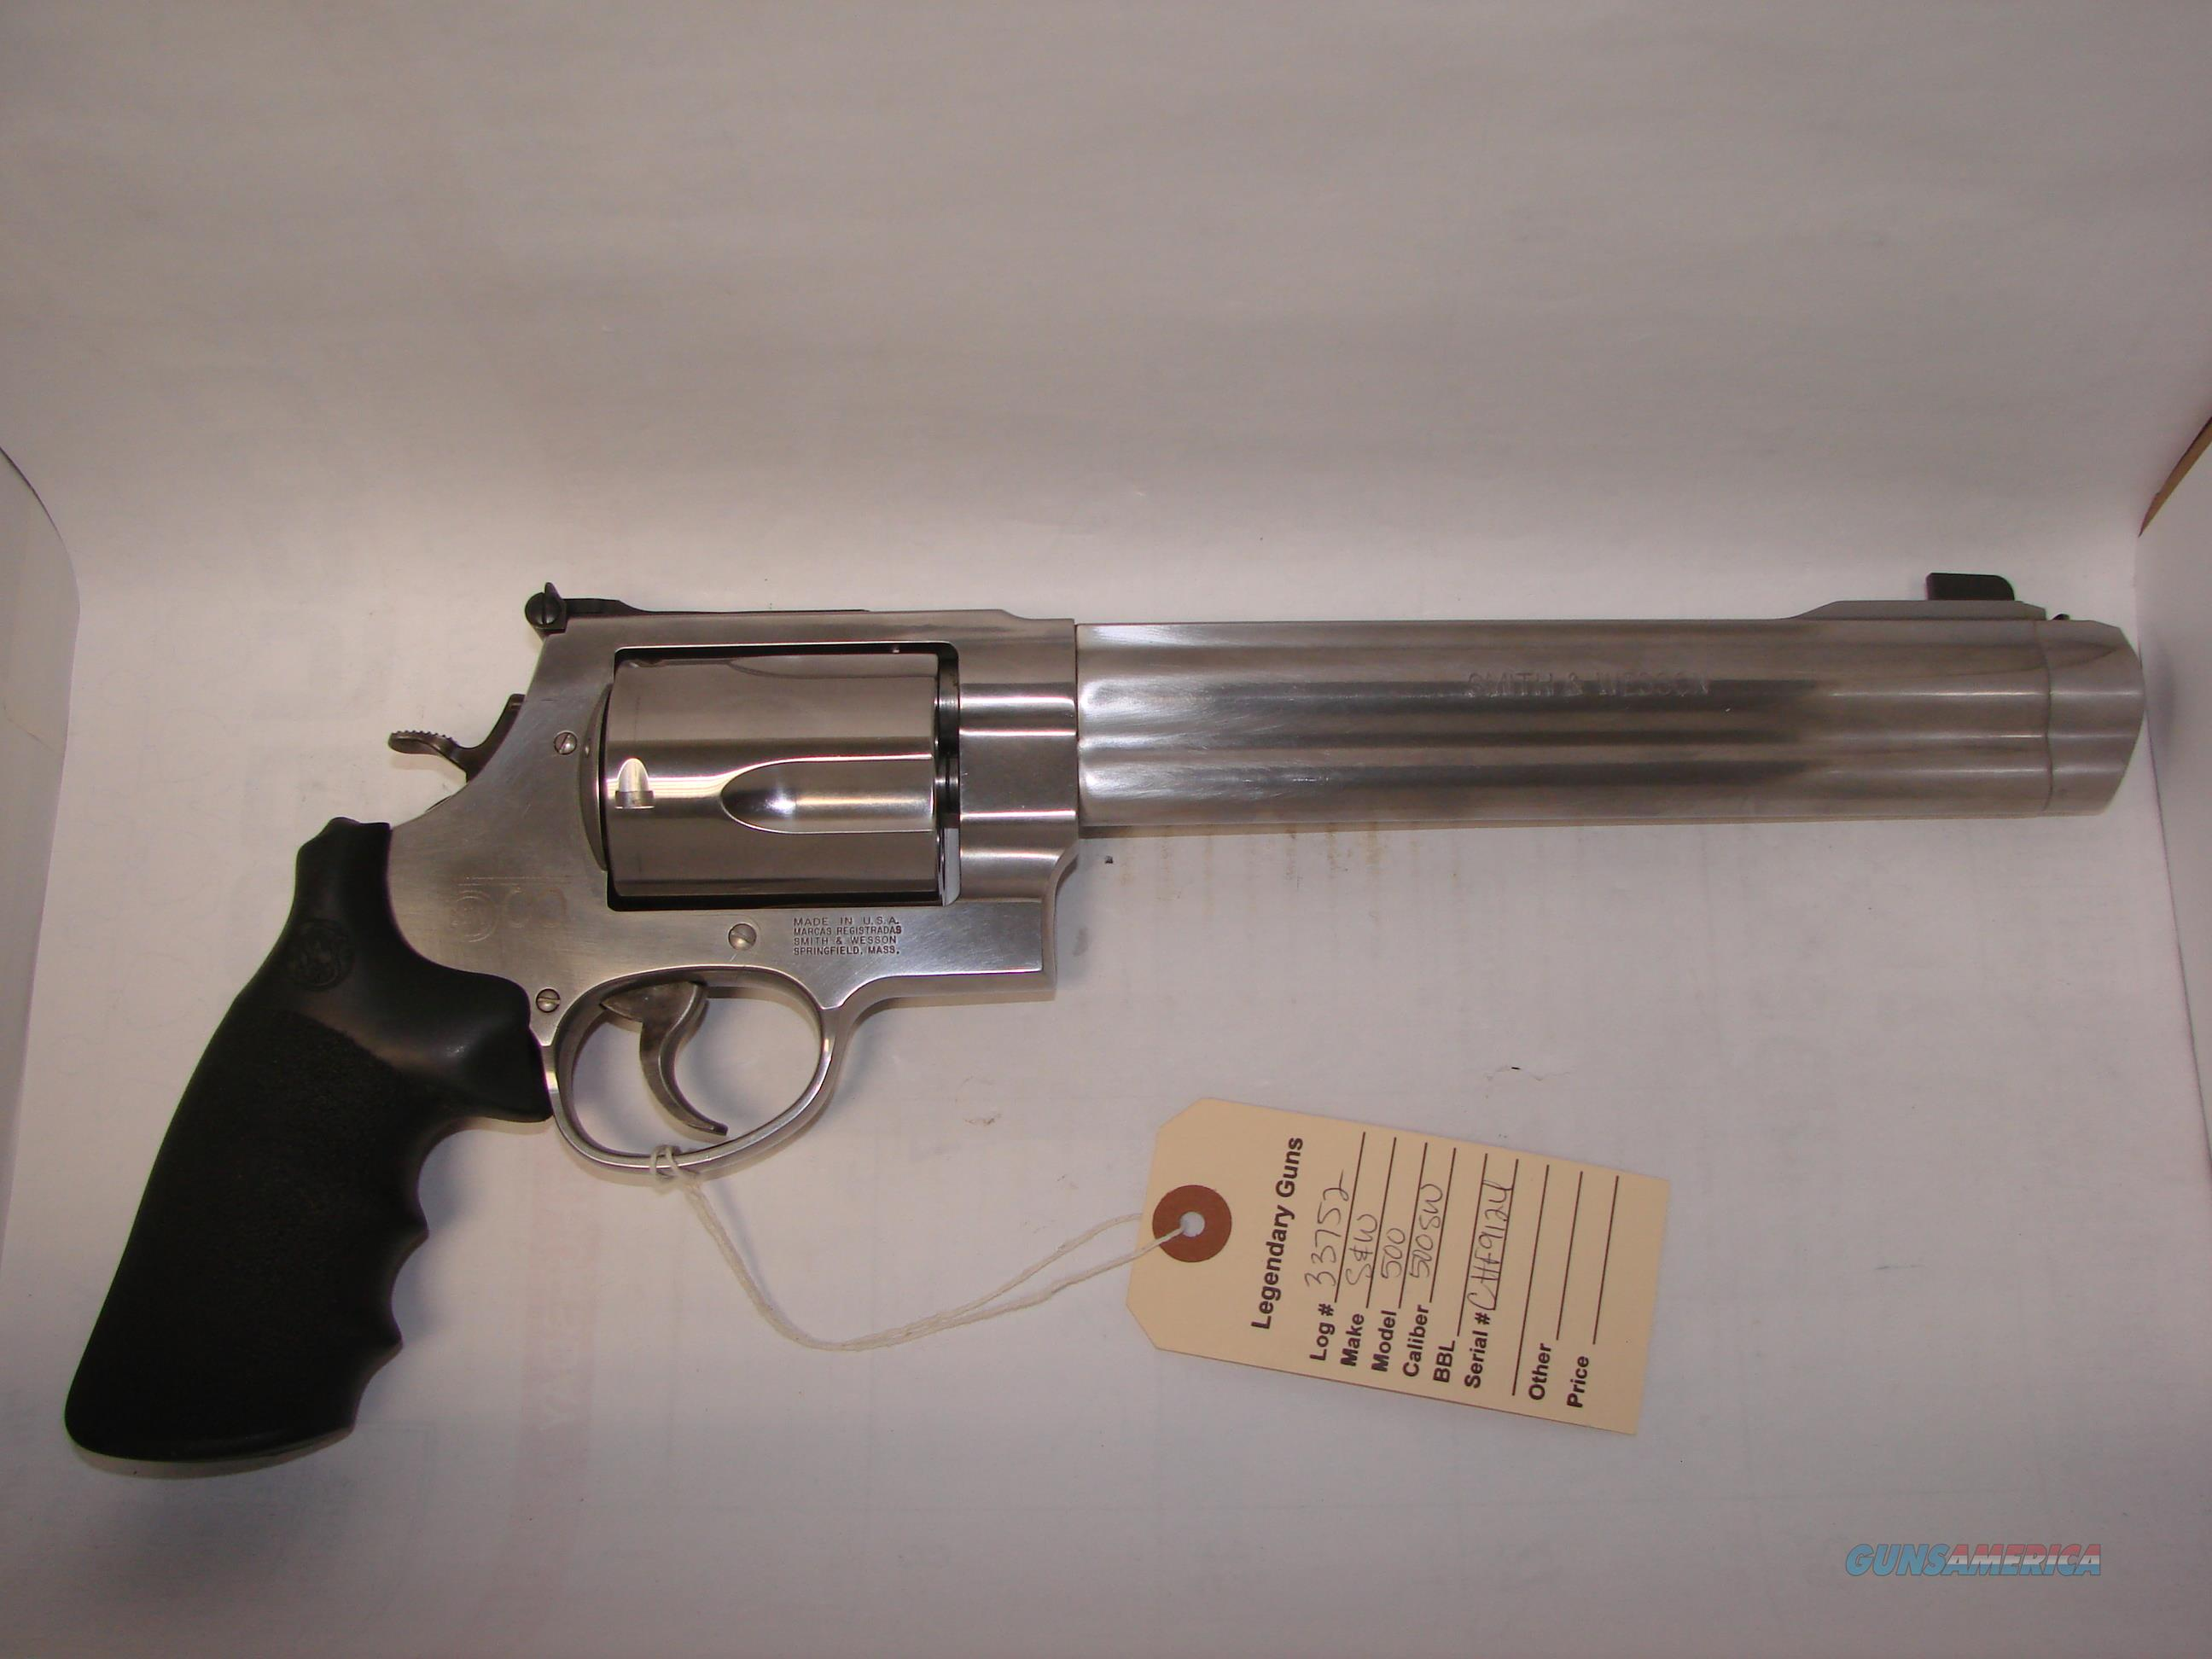 S&W 500  Guns > Pistols > Smith & Wesson Revolvers > Full Frame Revolver